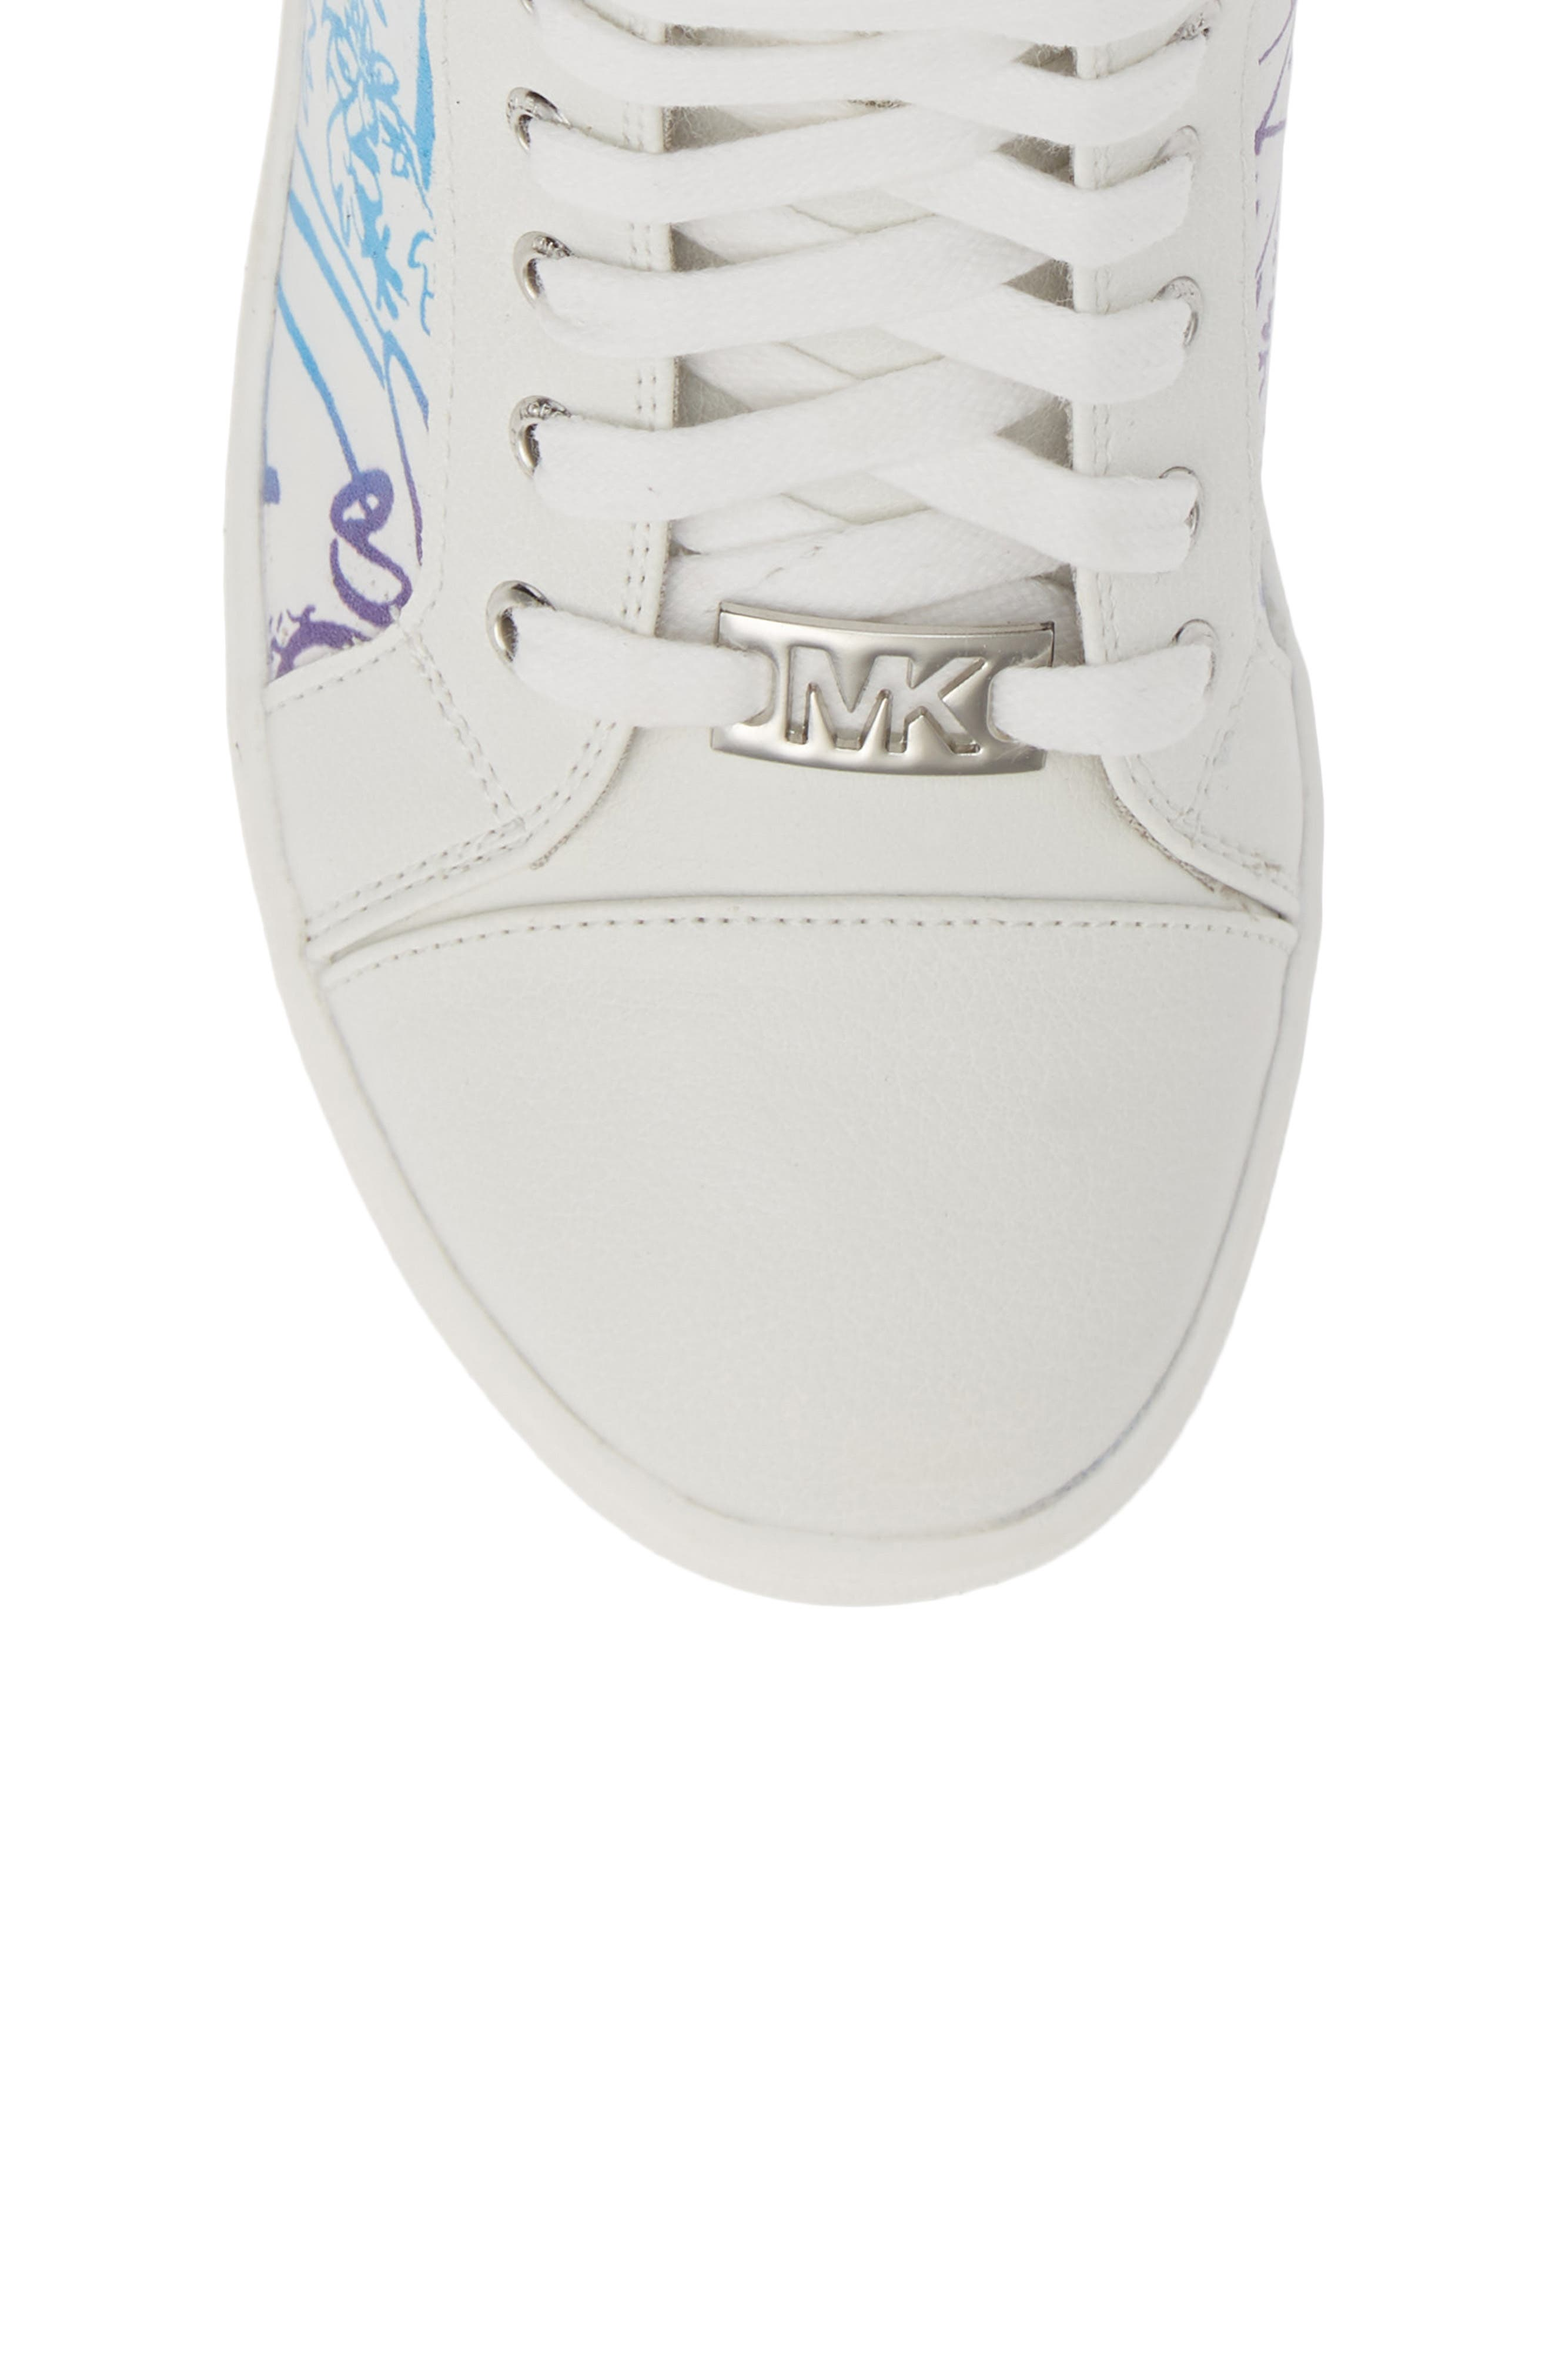 Ivy Spectra High Top Sneaker,                             Alternate thumbnail 5, color,                             WHITE MULTI